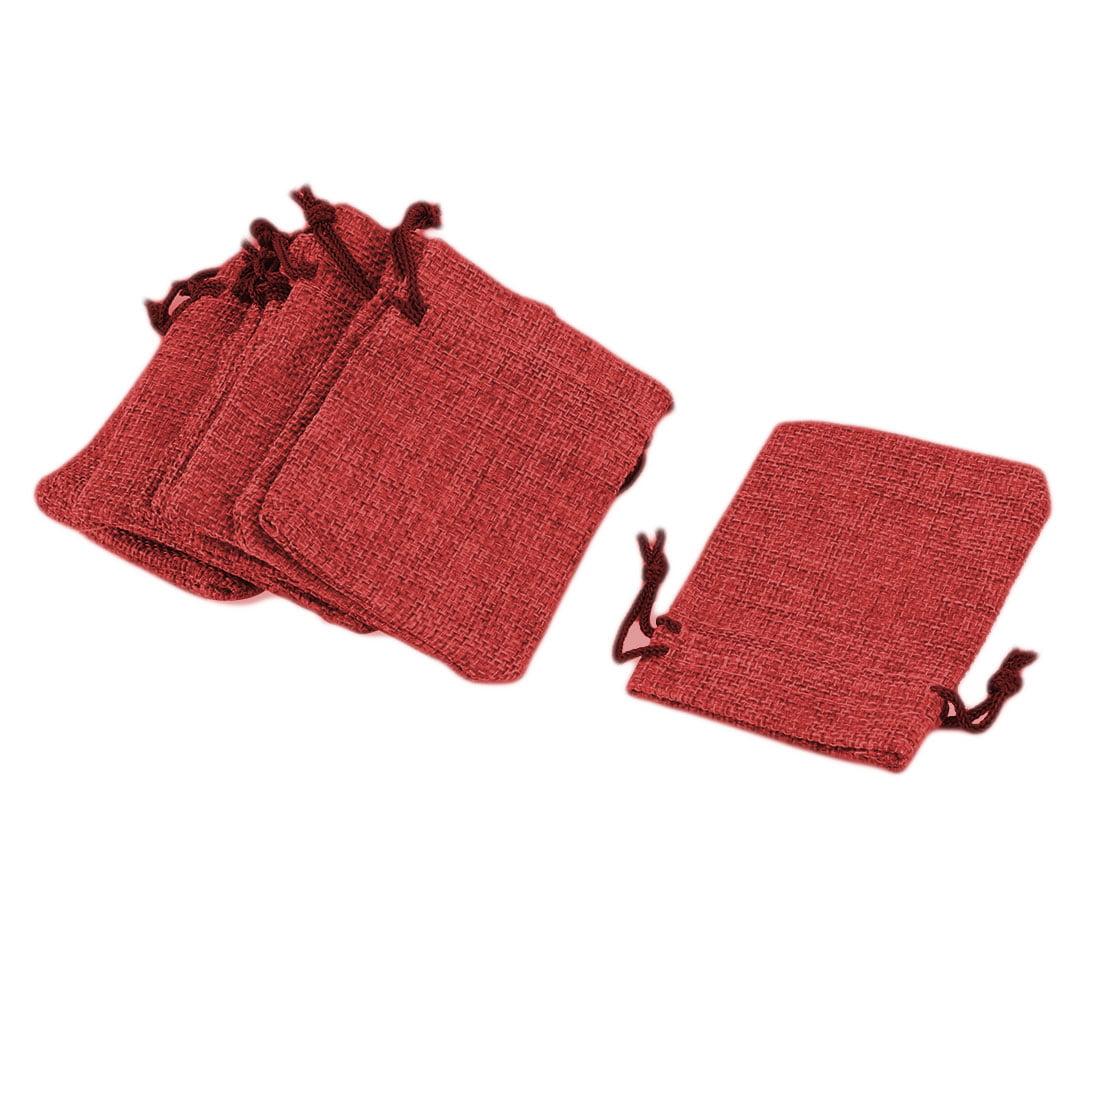 Cotton Linen Jewelry Tea Leaves Petal Holder Drawstring Bag Pouch Burgundy 10pcs